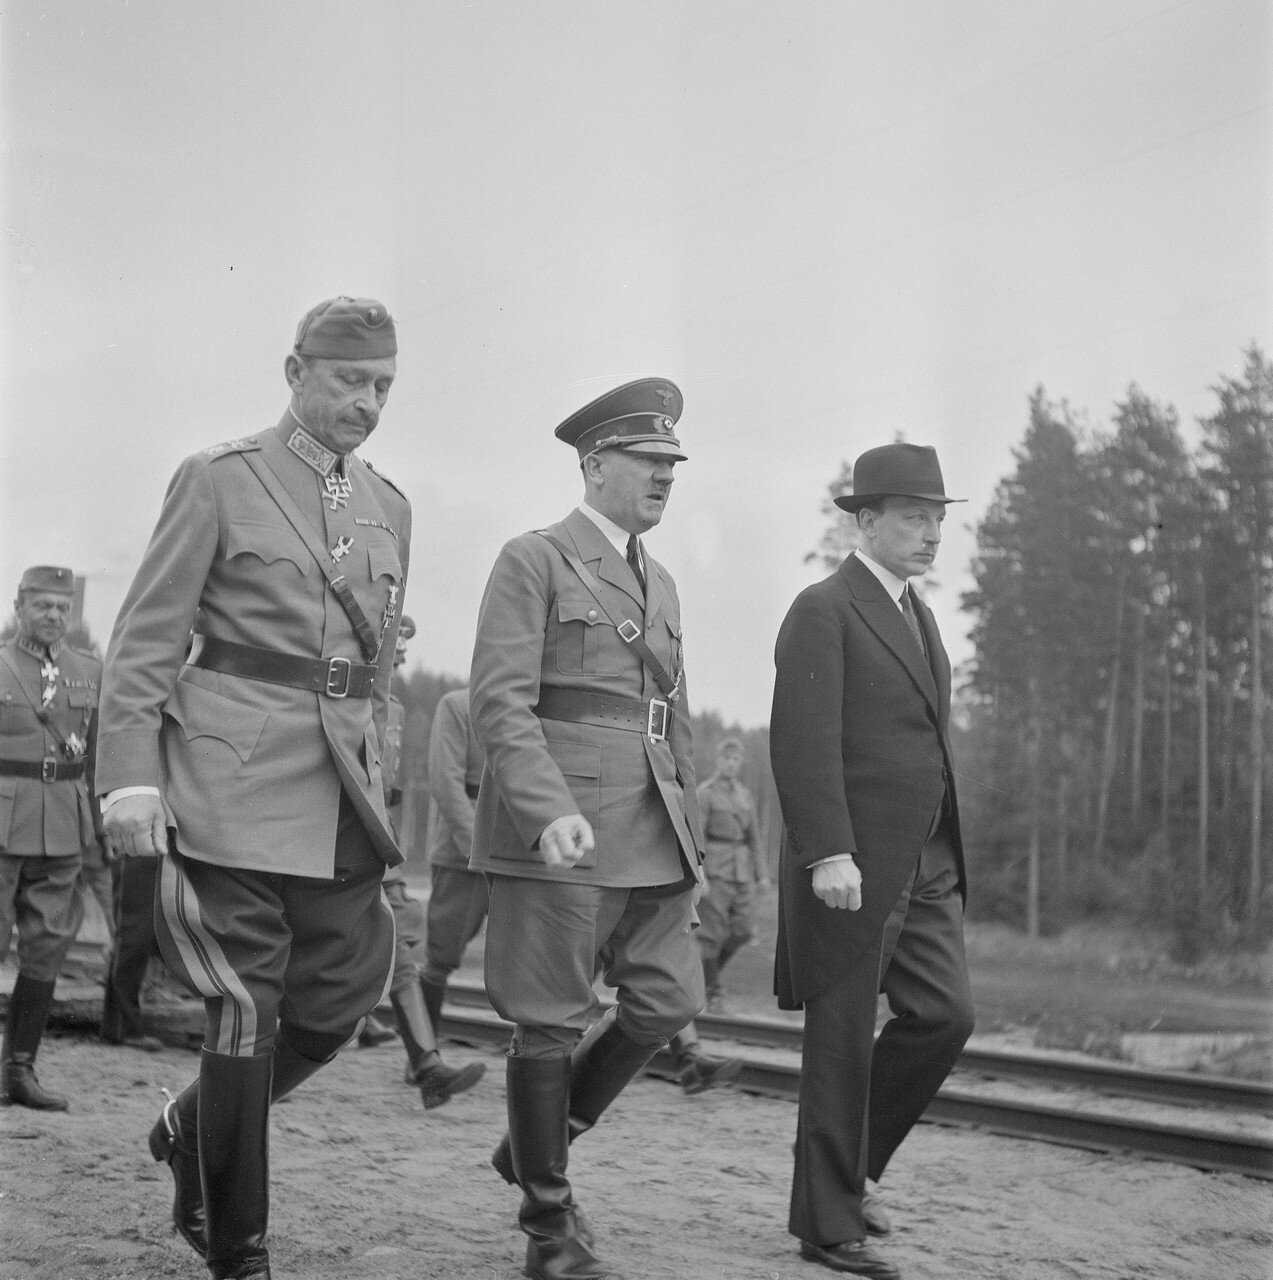 Карл Густав Эмиль Маннергейм, Адольф Гитлер и Ристо Рюти 4 июня 1942